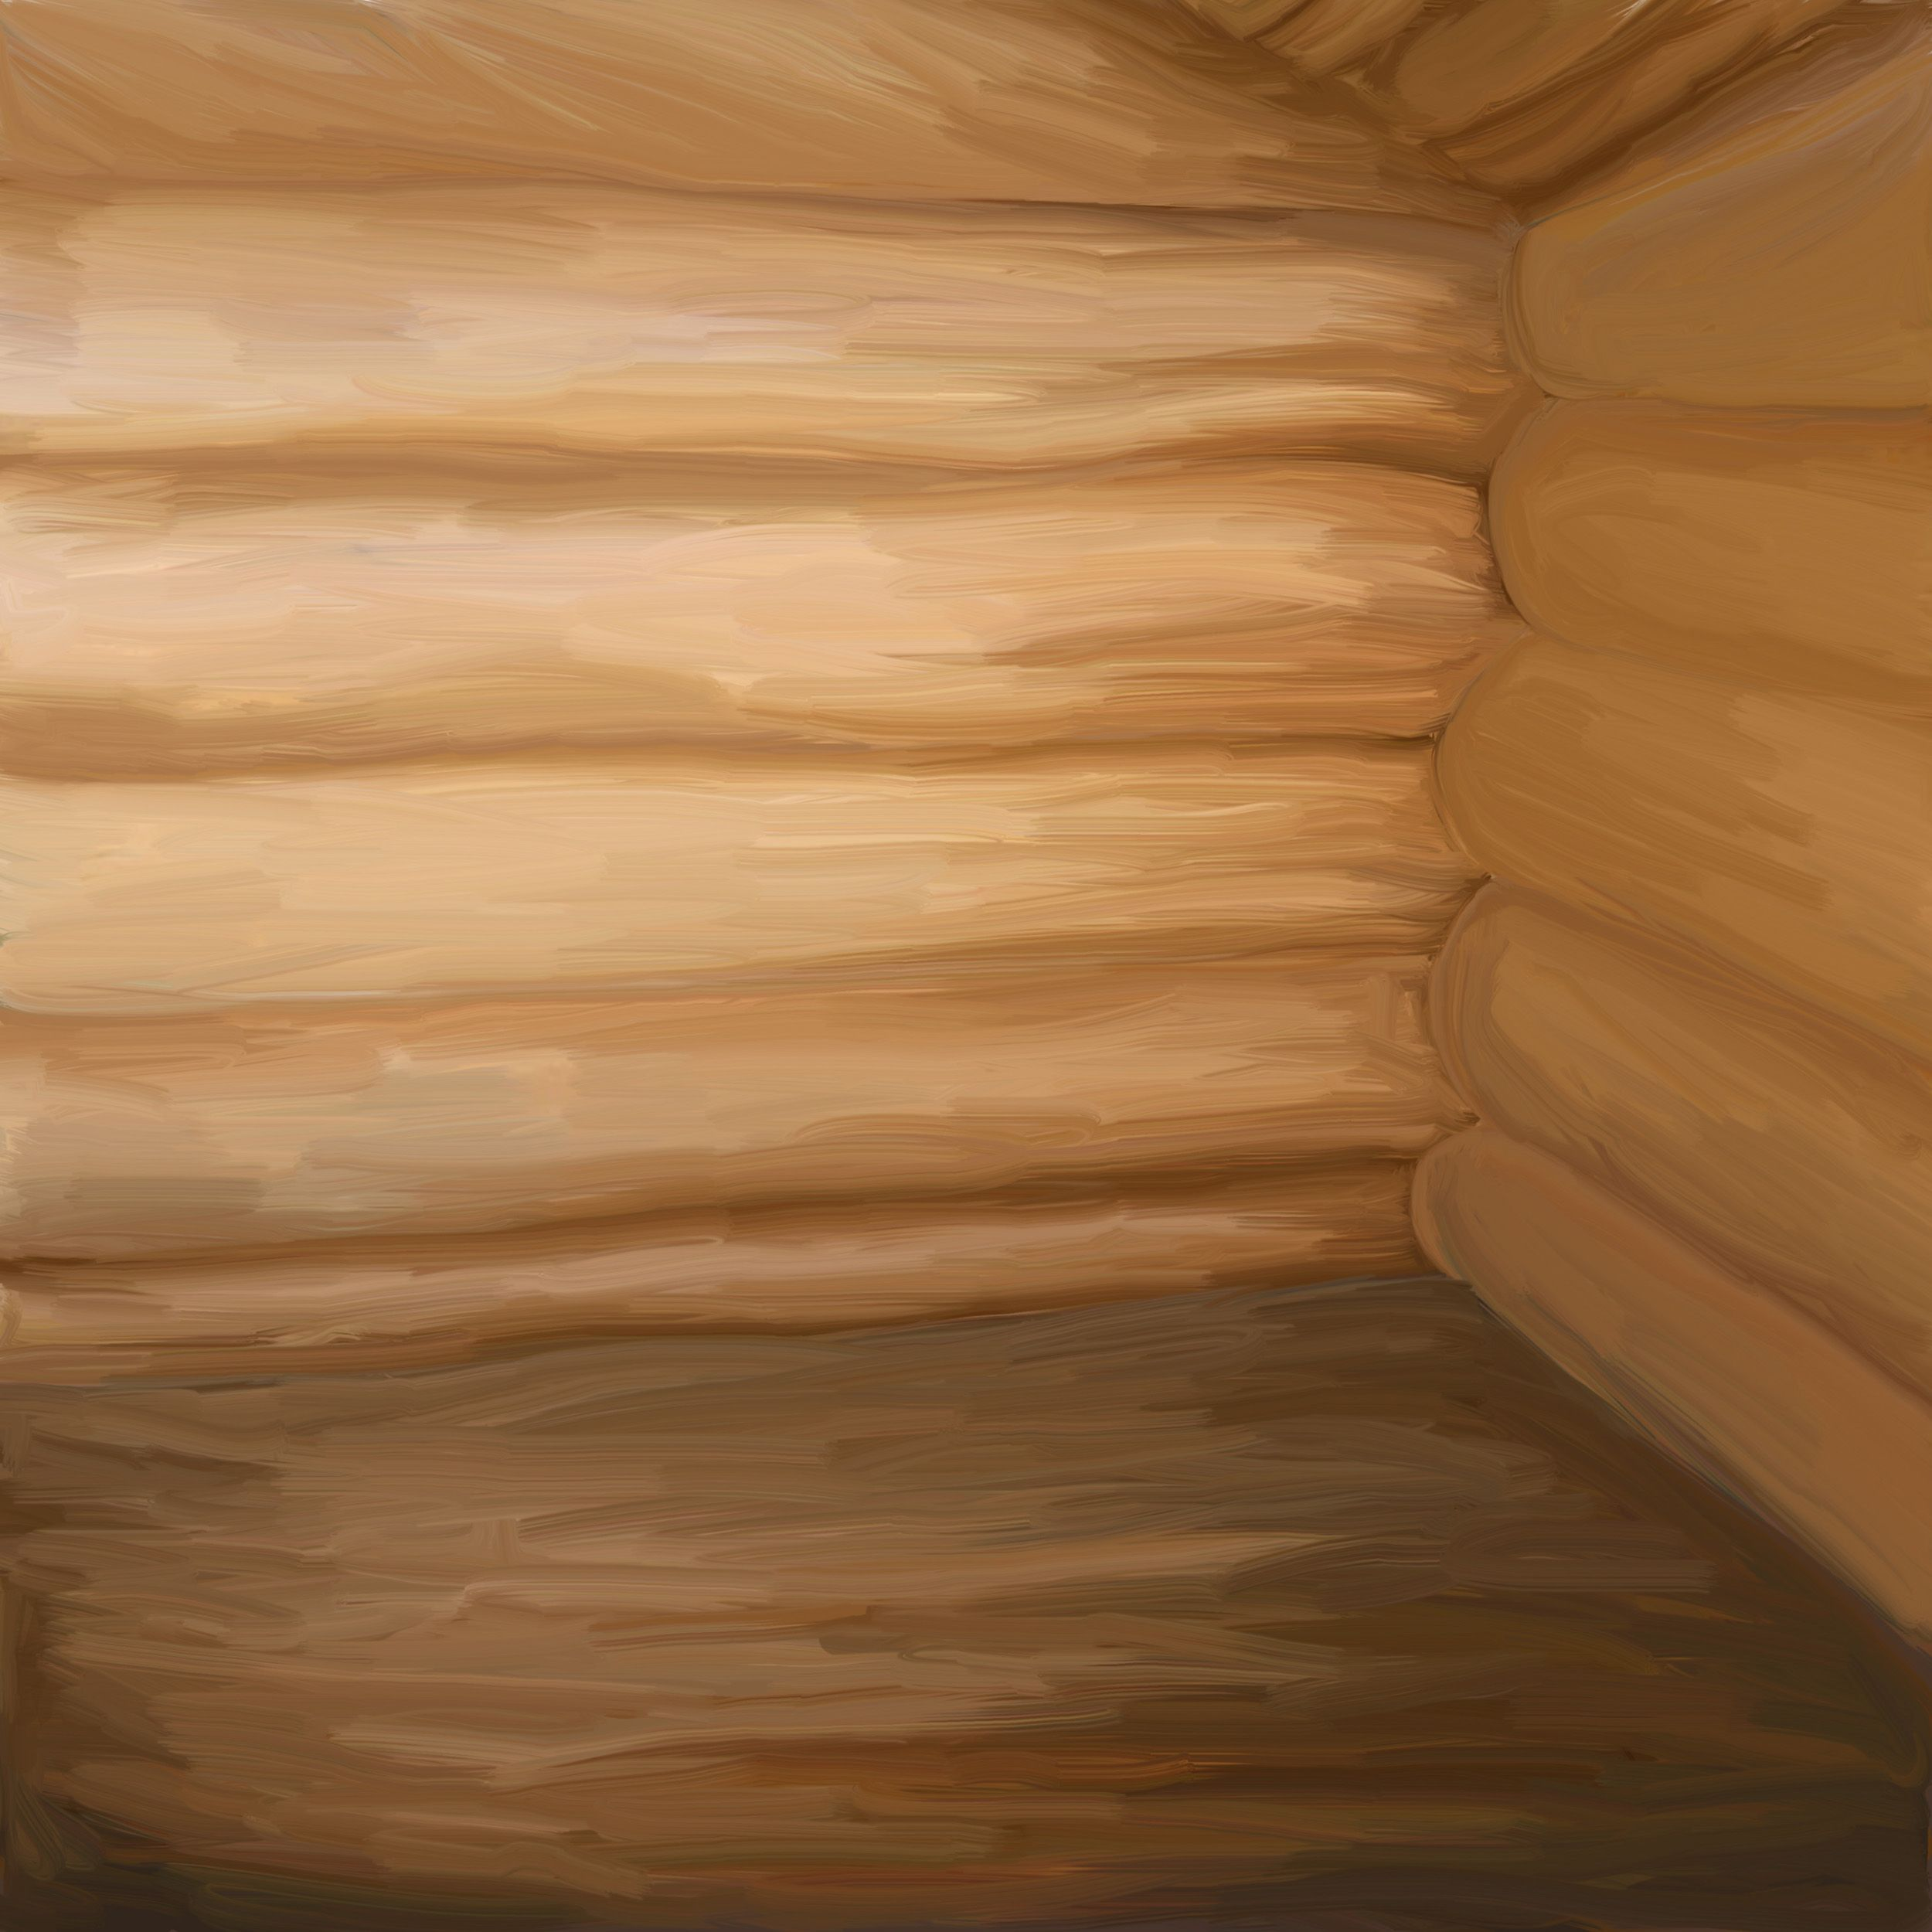 Рисунок на бревне внутри дома